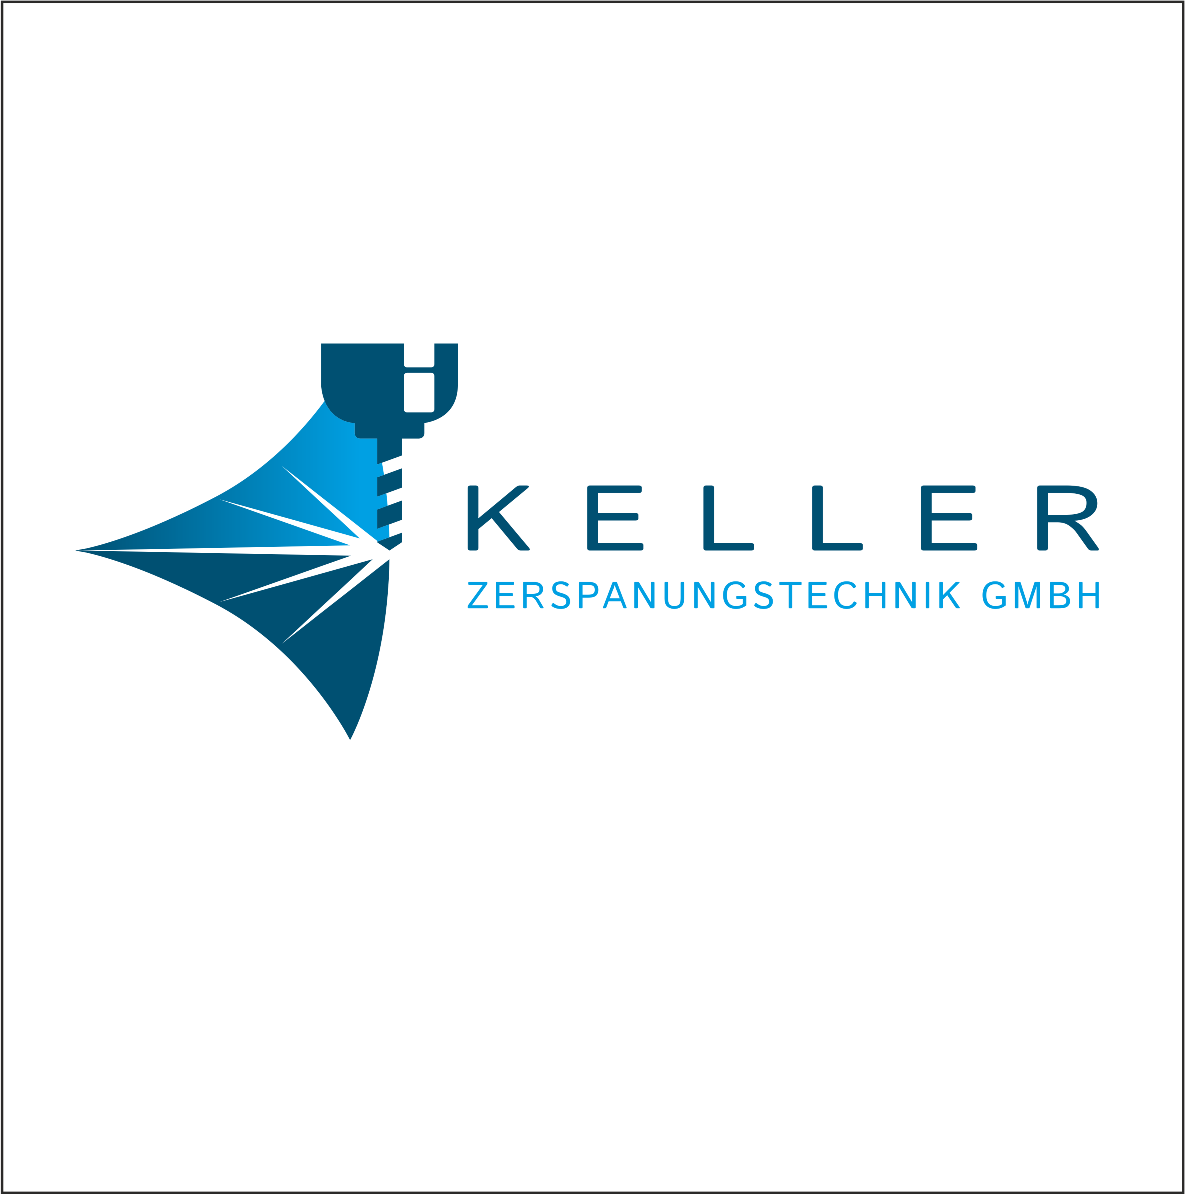 Keller Zerspanungstechnik